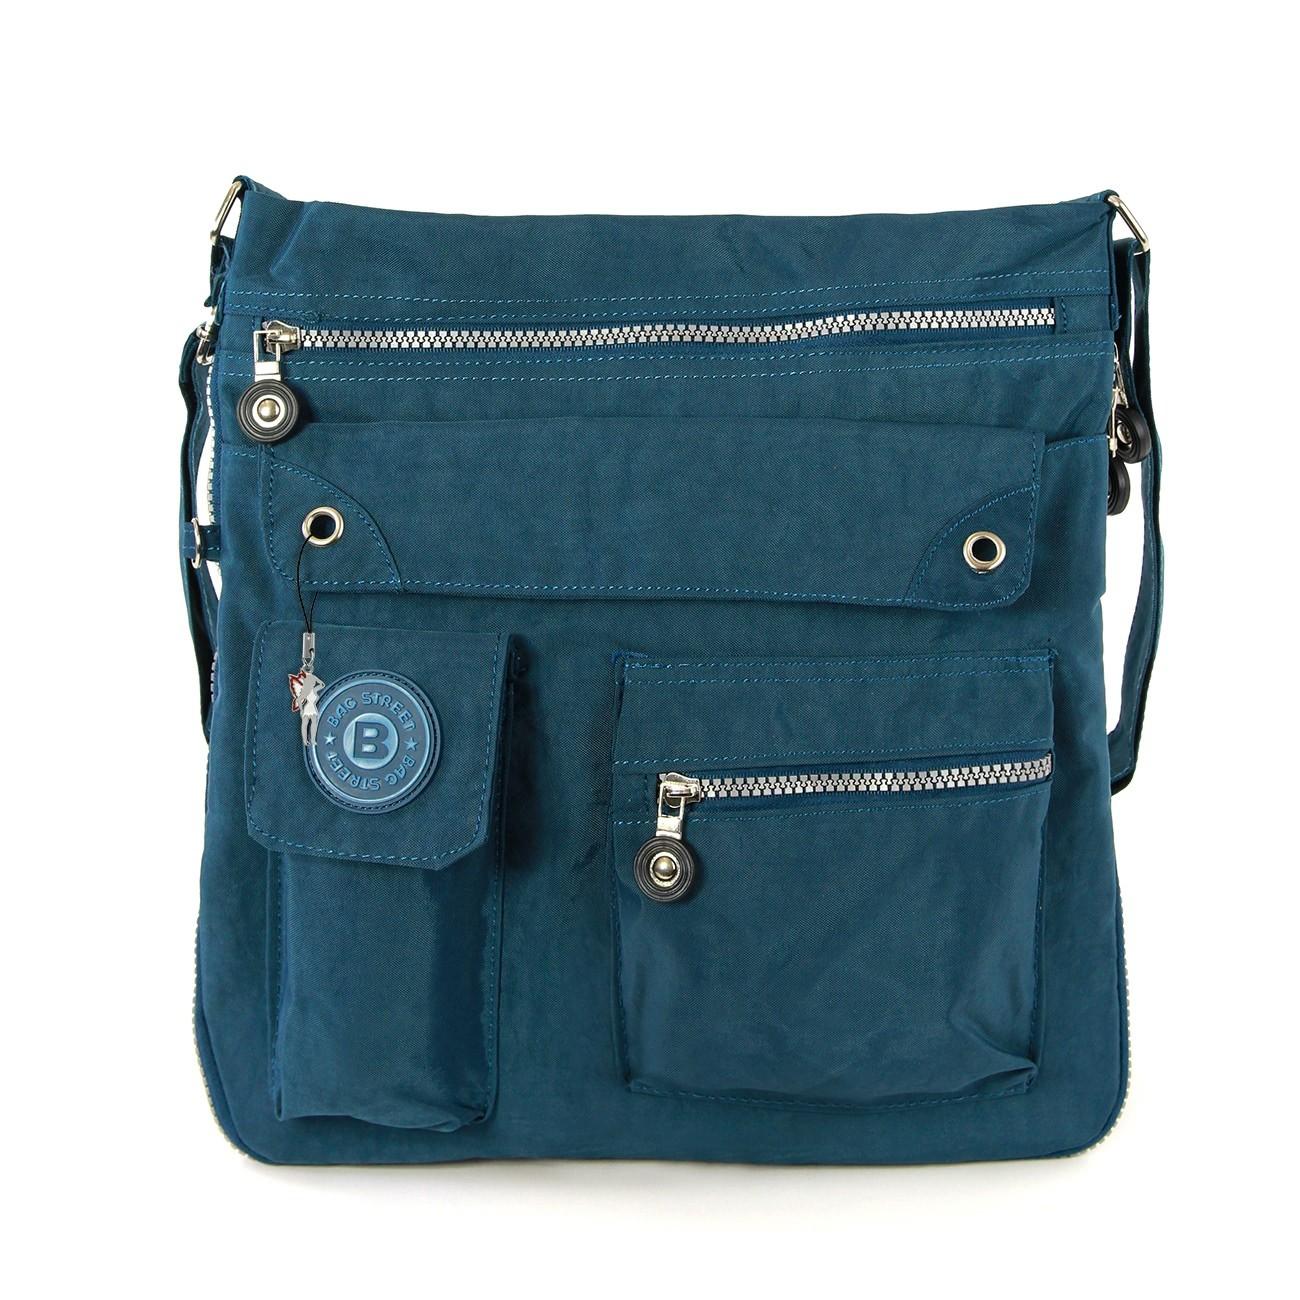 Umhängetasche Nylon blau Cross-Body Schultertasche Bag Street OTJ206T